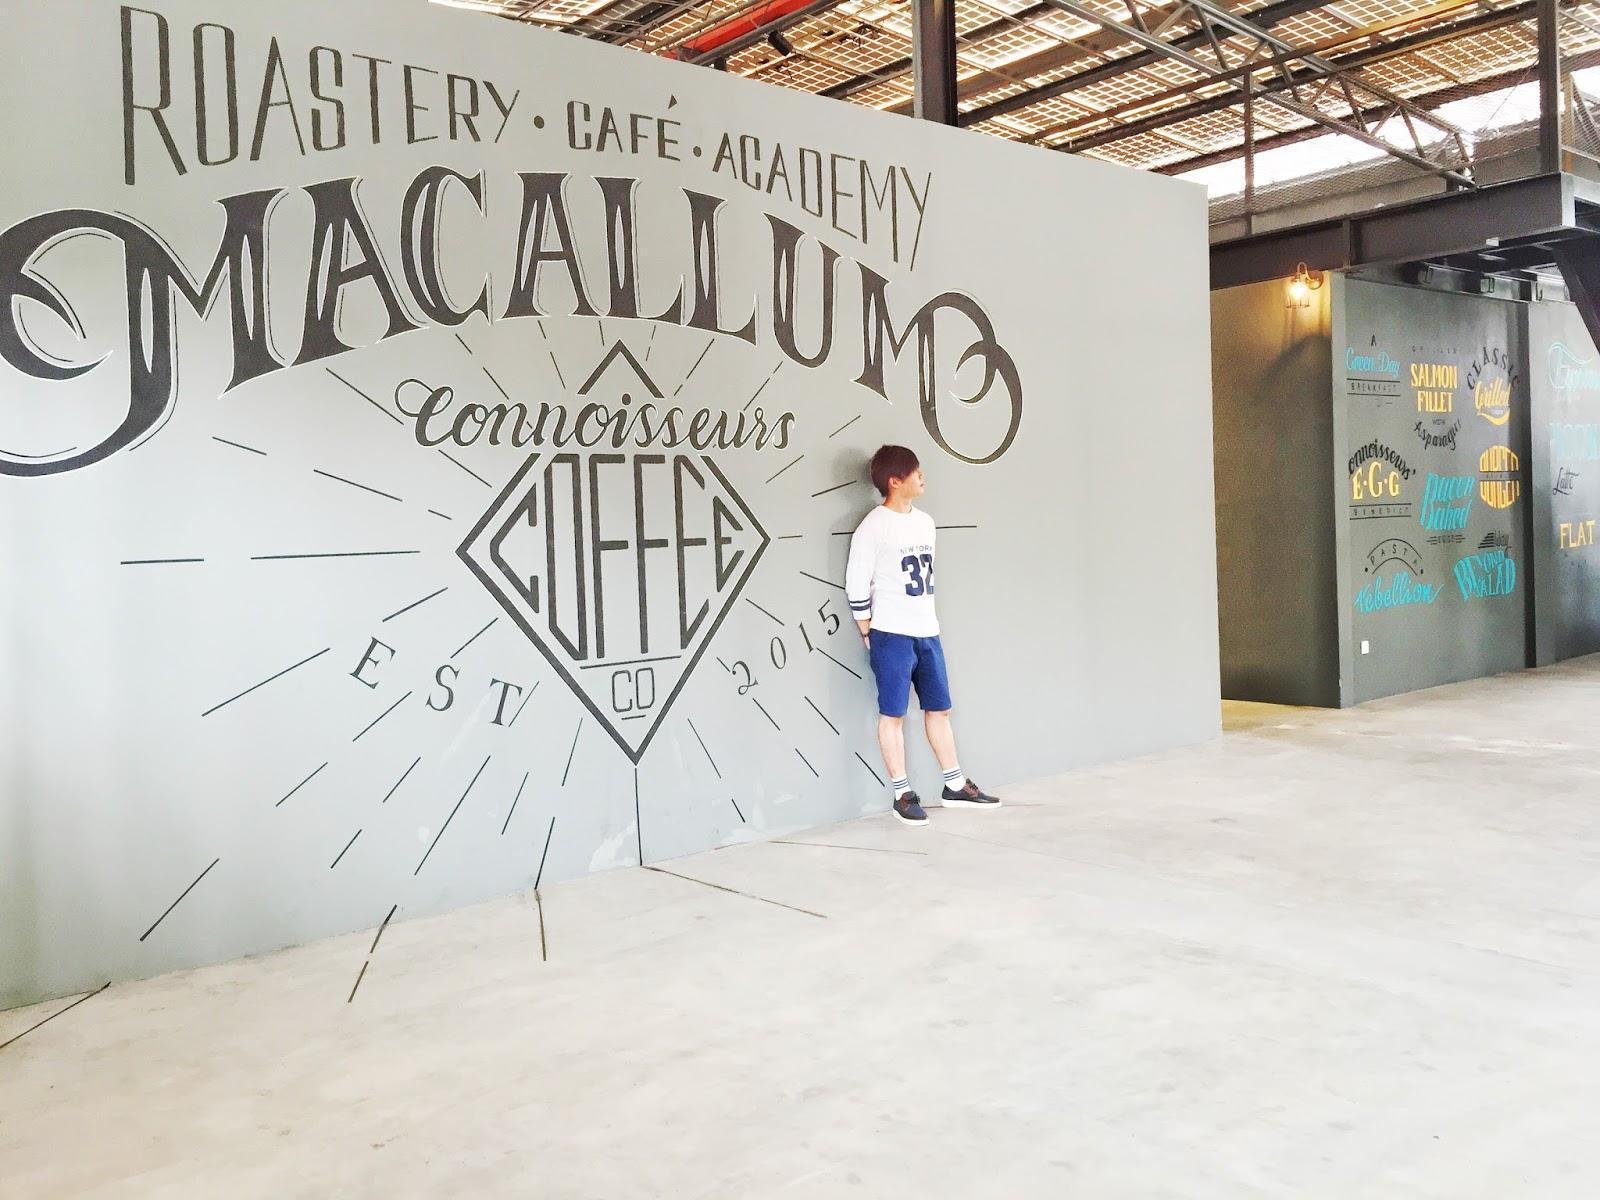 Penang Cafes - Macallum Wall Evilbean